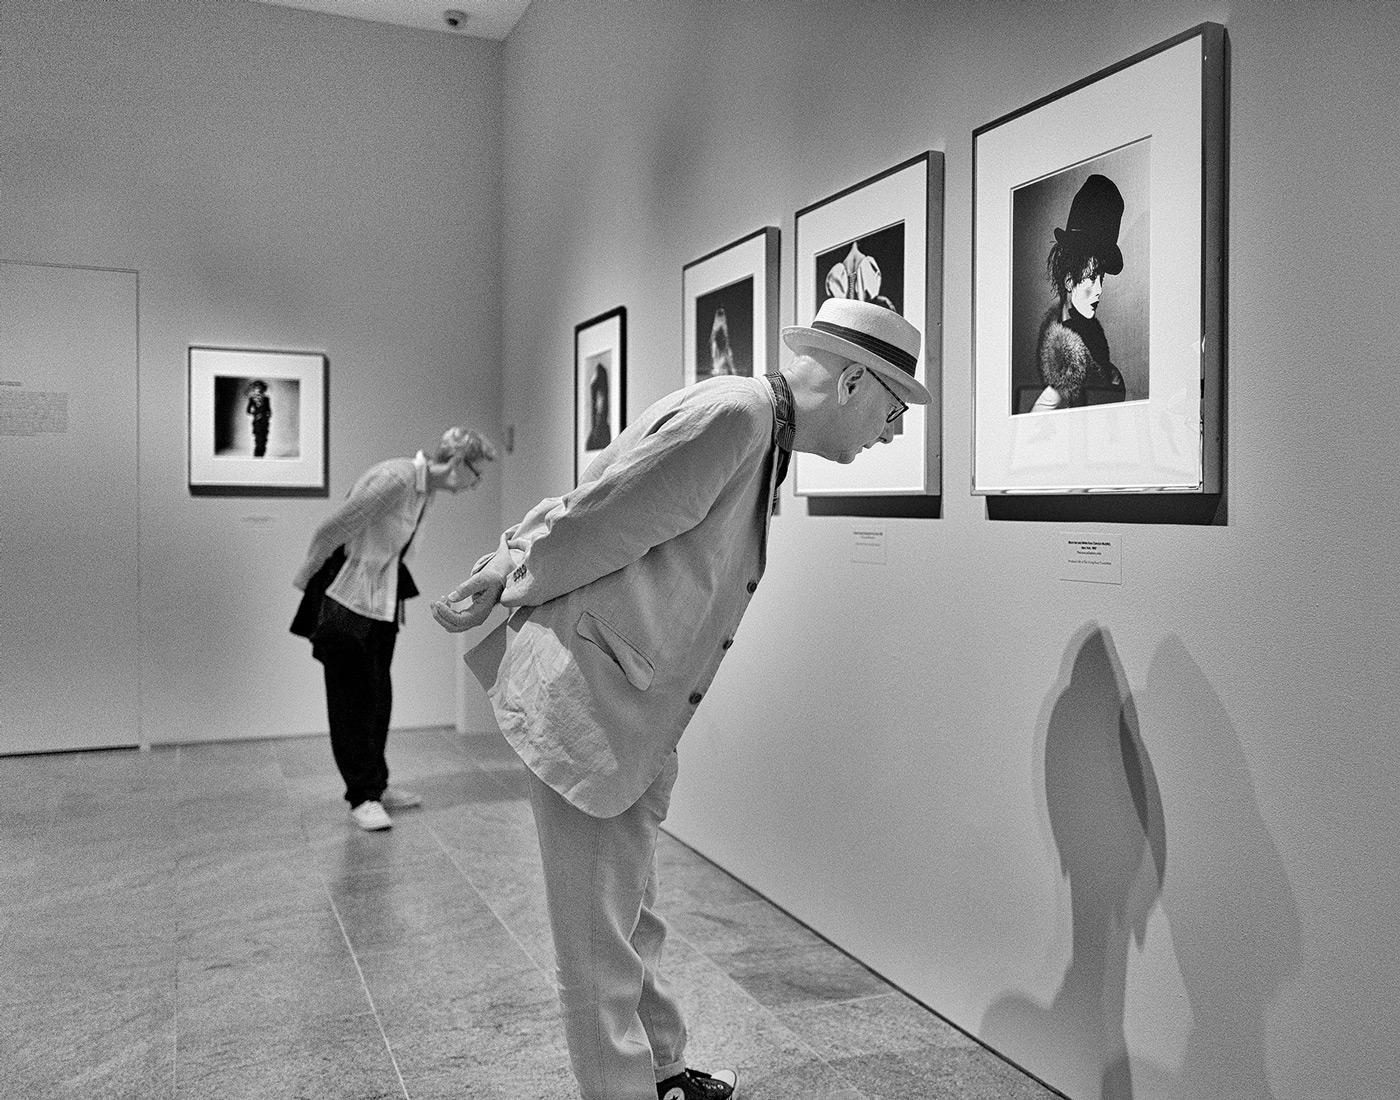 William-Bullard_USA_Pictures-at-an-Exhibition_16.jpeg